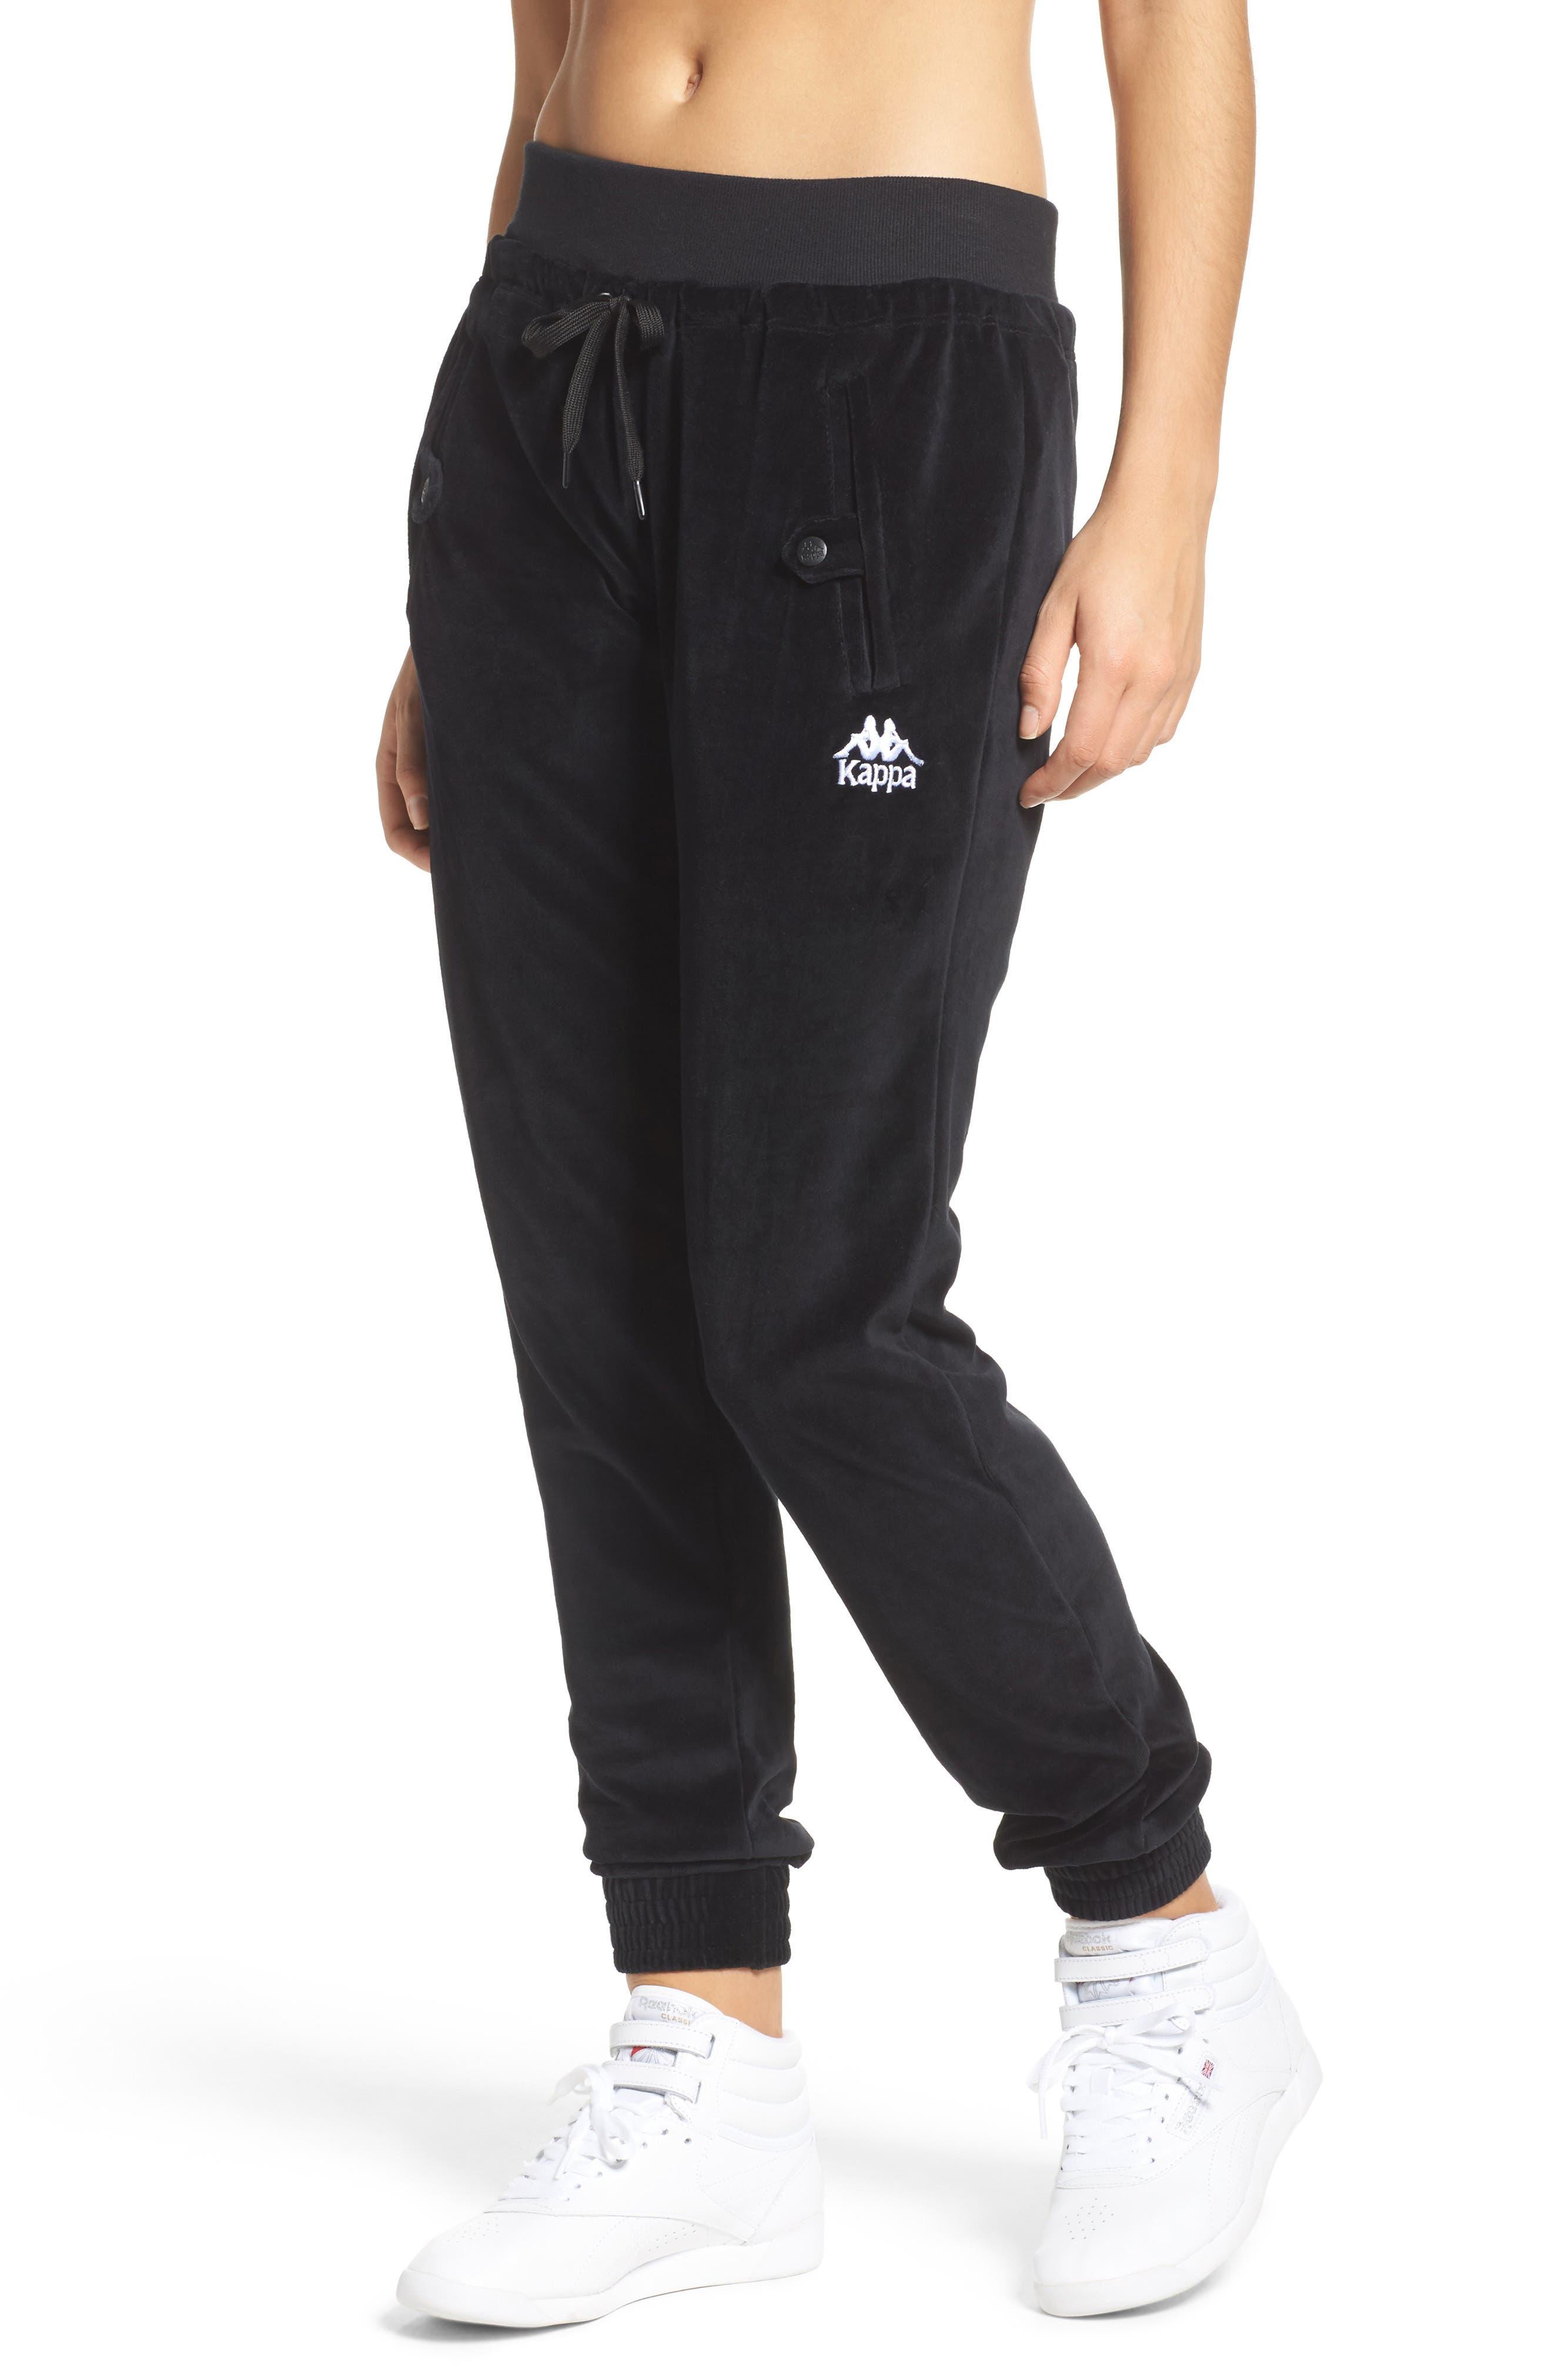 Alternate Image 1 Selected - Kappa Authentic Screwball Track Pants